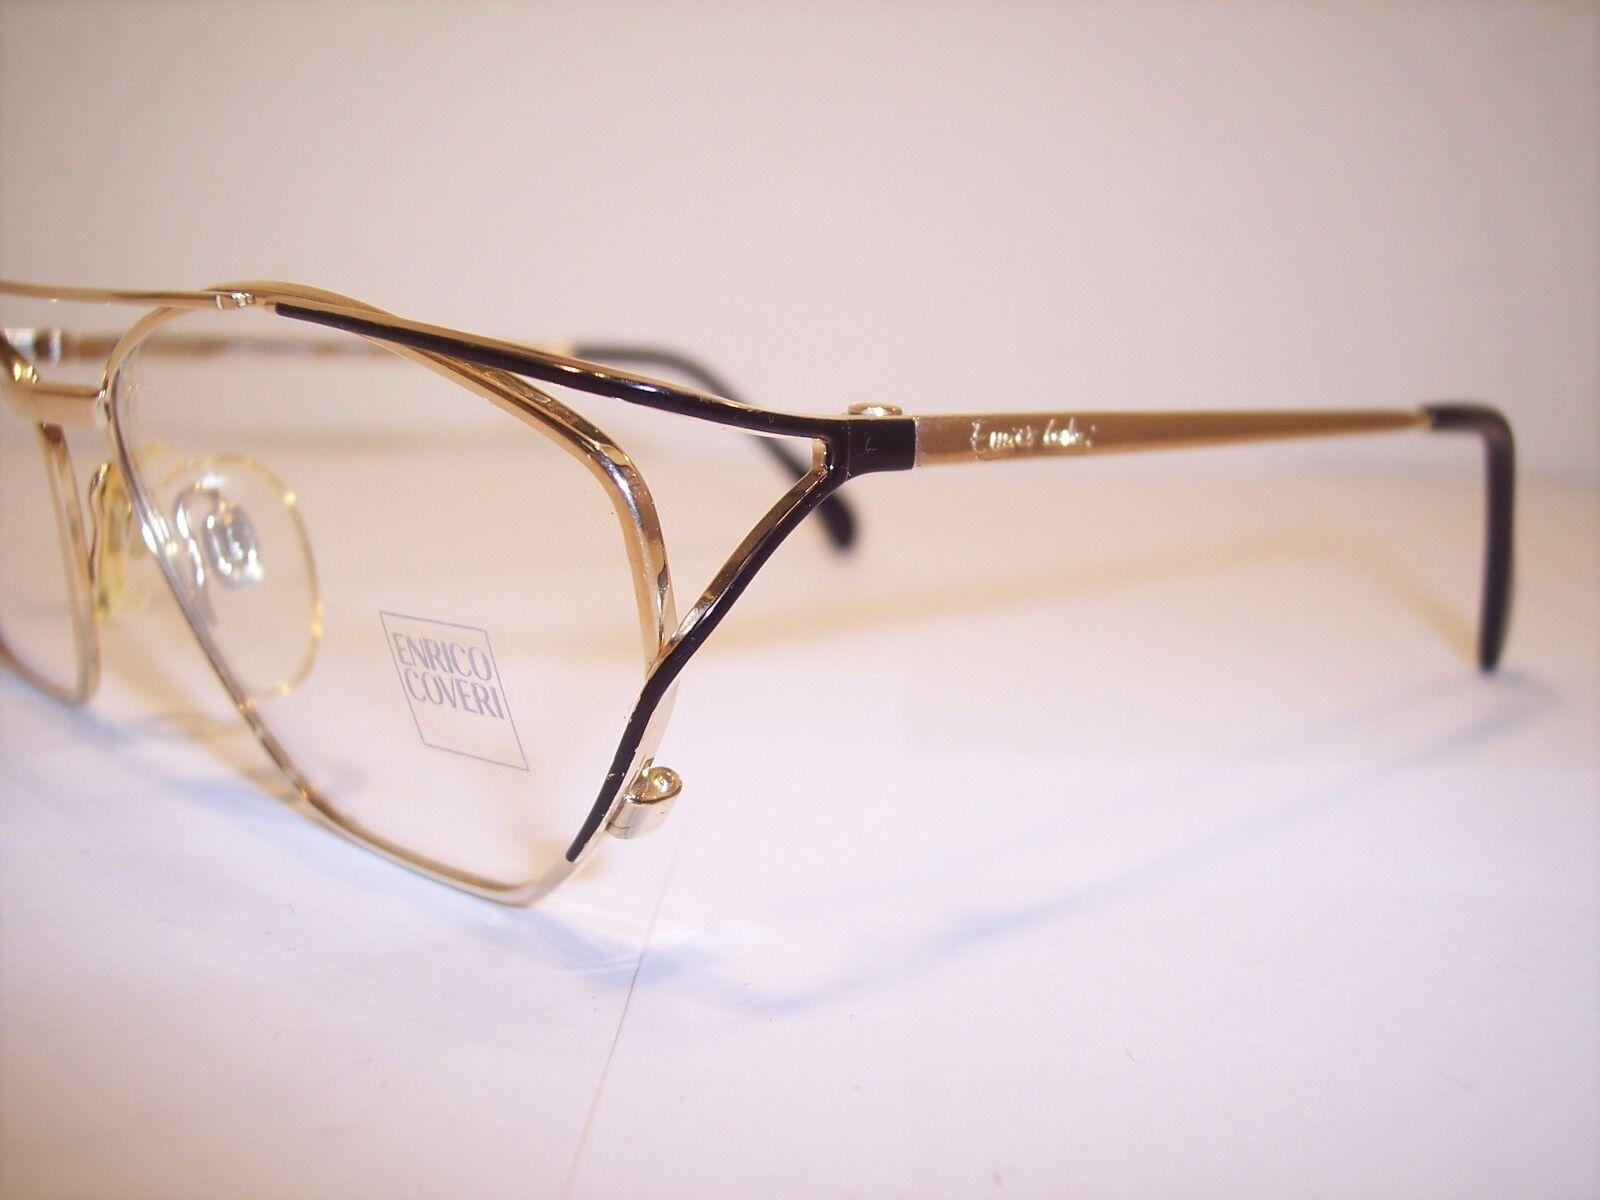 Damen-Brille Eyeglasses Lunettes by ENRICO COVERI COVERI COVERI 100%Vintage Original 90'er 7ea34a